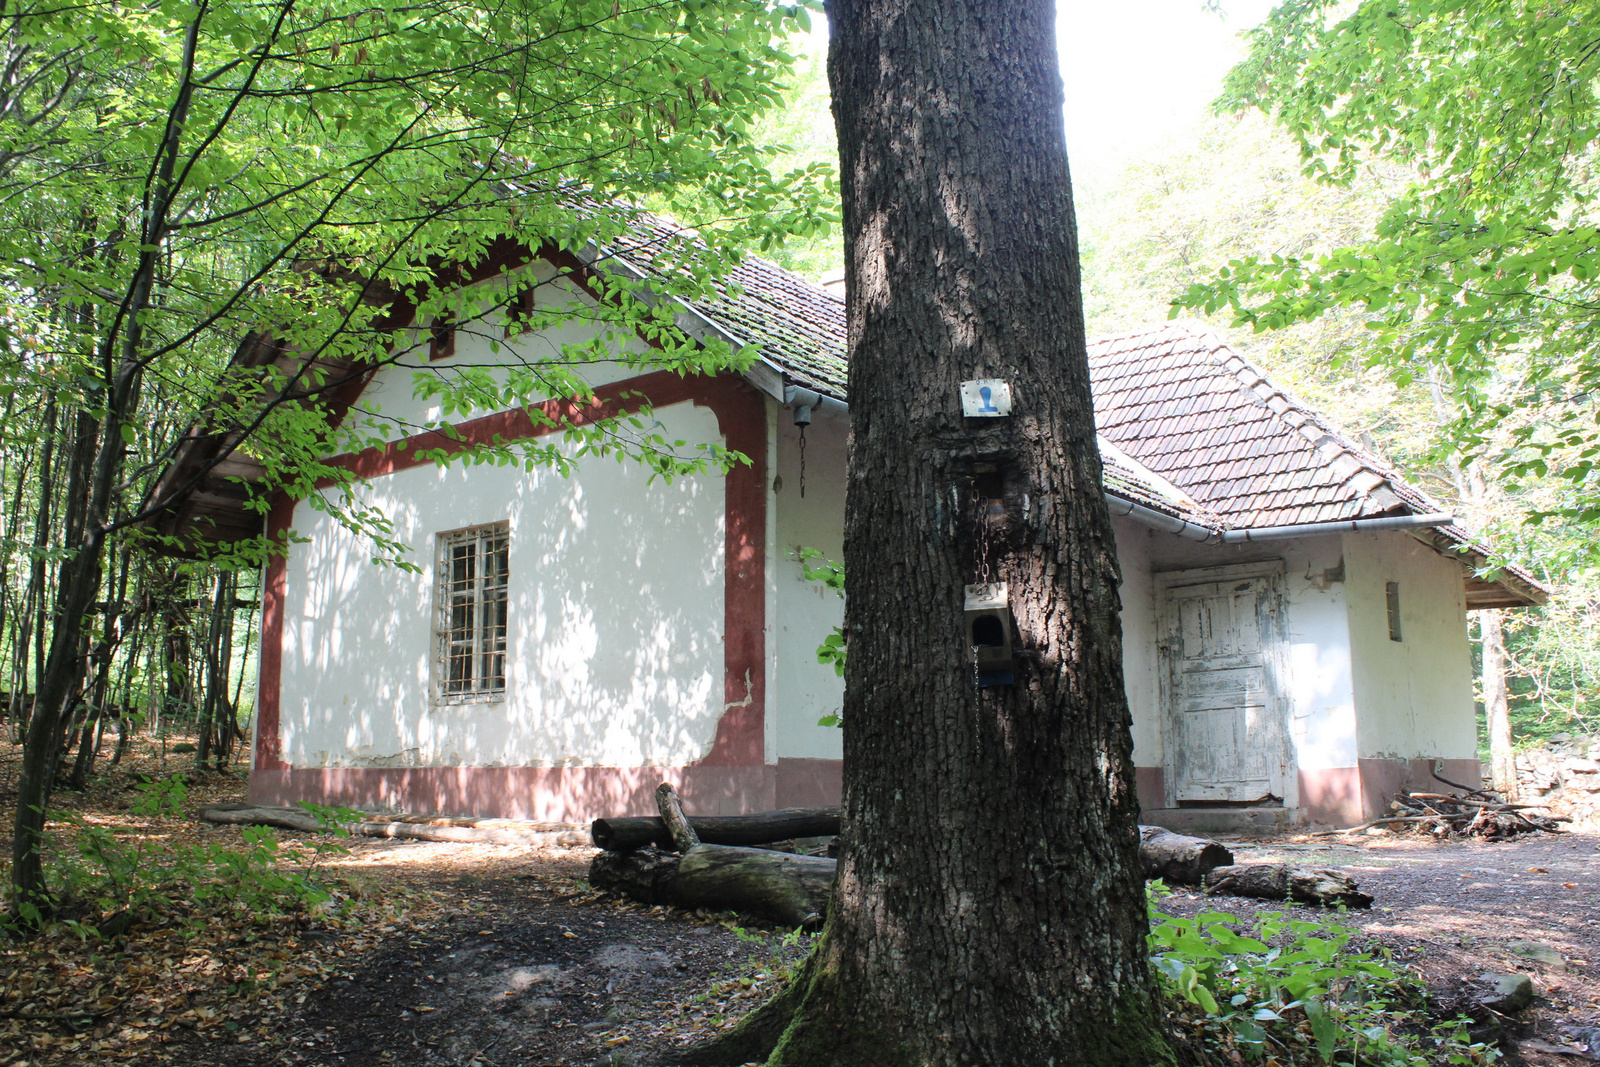 20180825-39-Istvankut-Vadaszhaz